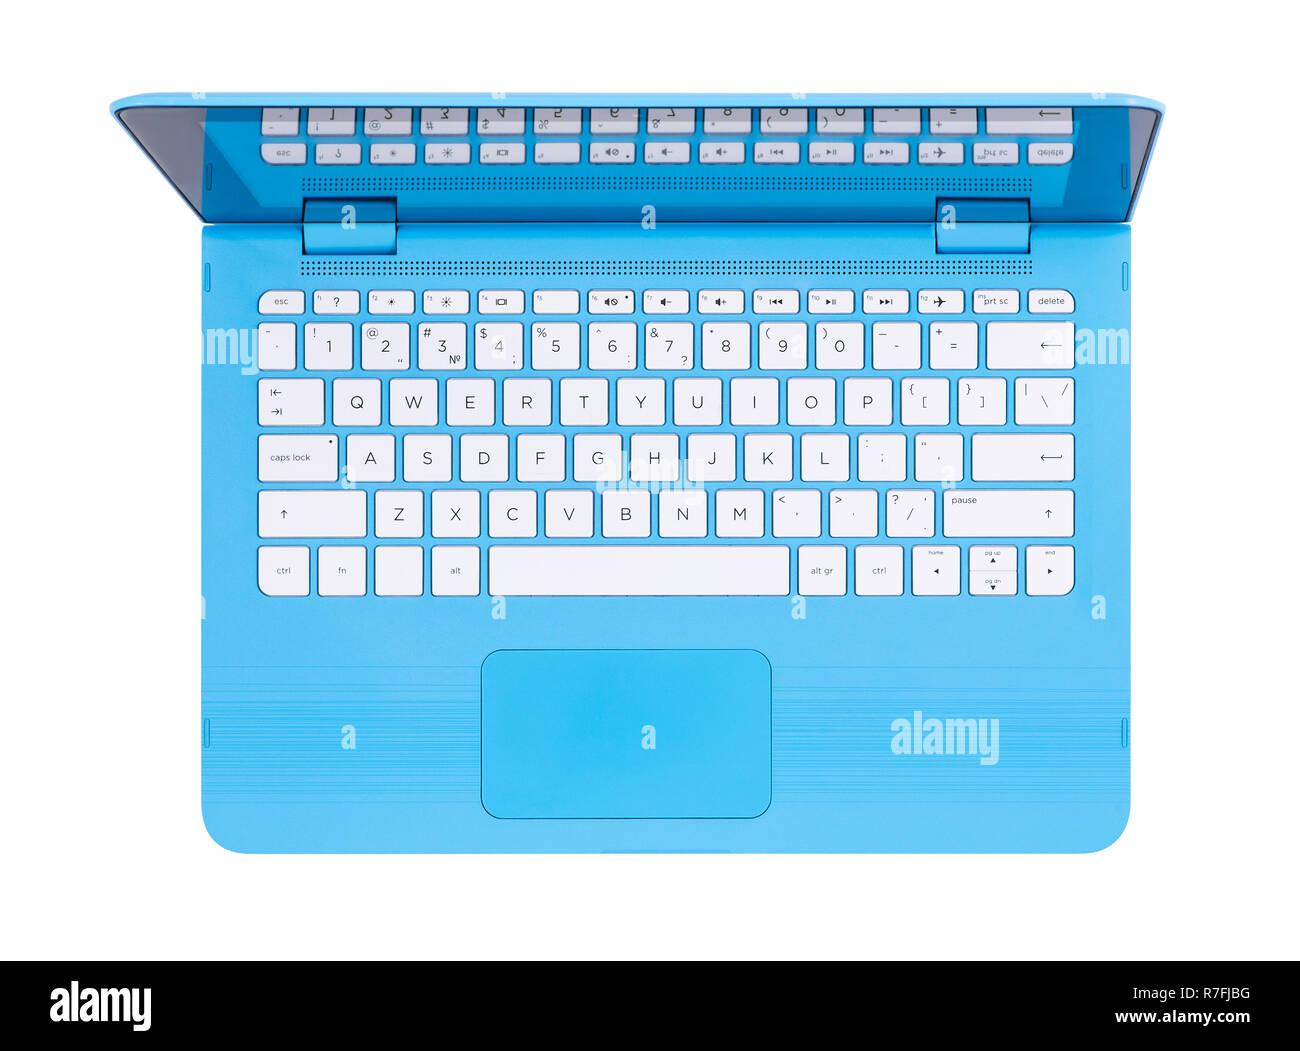 e3a3e00066f English Keyboard Stock Photos & English Keyboard Stock Images - Alamy